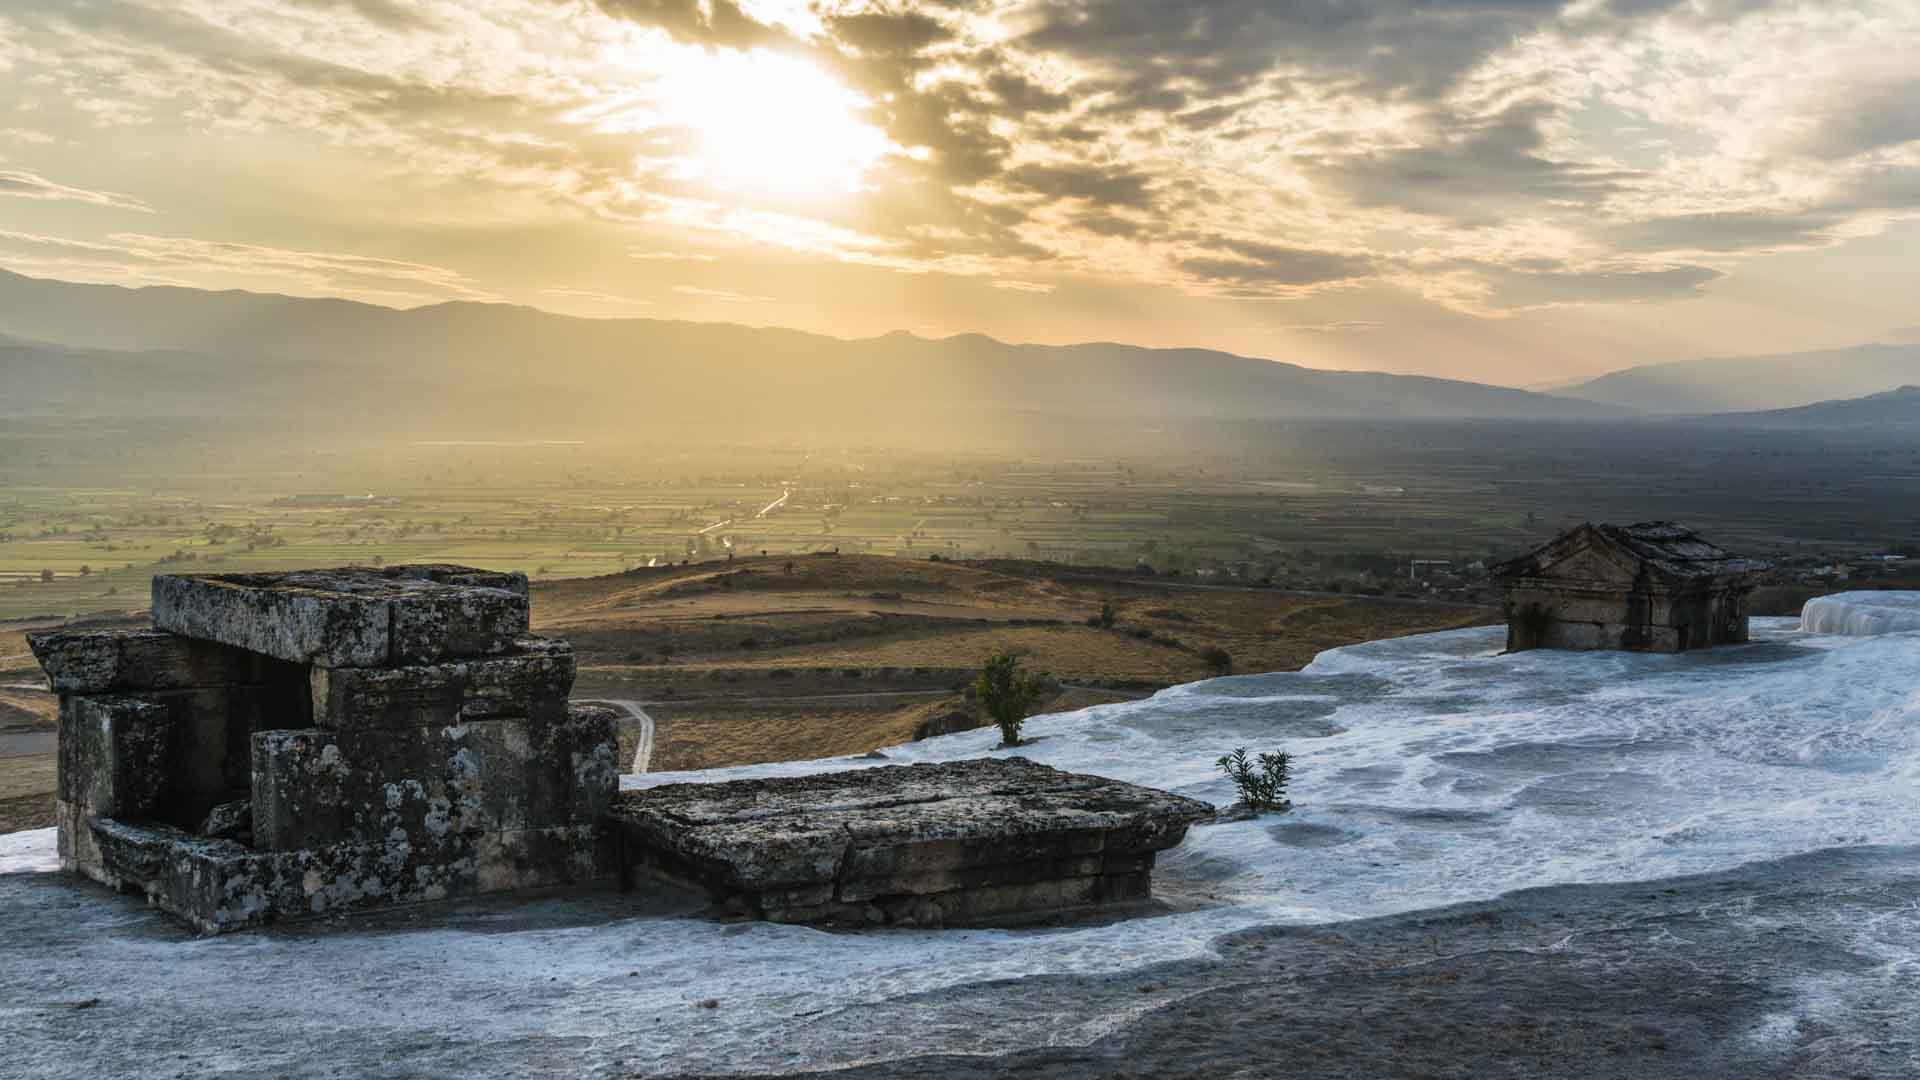 SerialHikers stop autostop world monde tour hitchhiking aventure adventure alternative travel voyage sans avion no fly Turquie pamukkale hierapolis Turkey